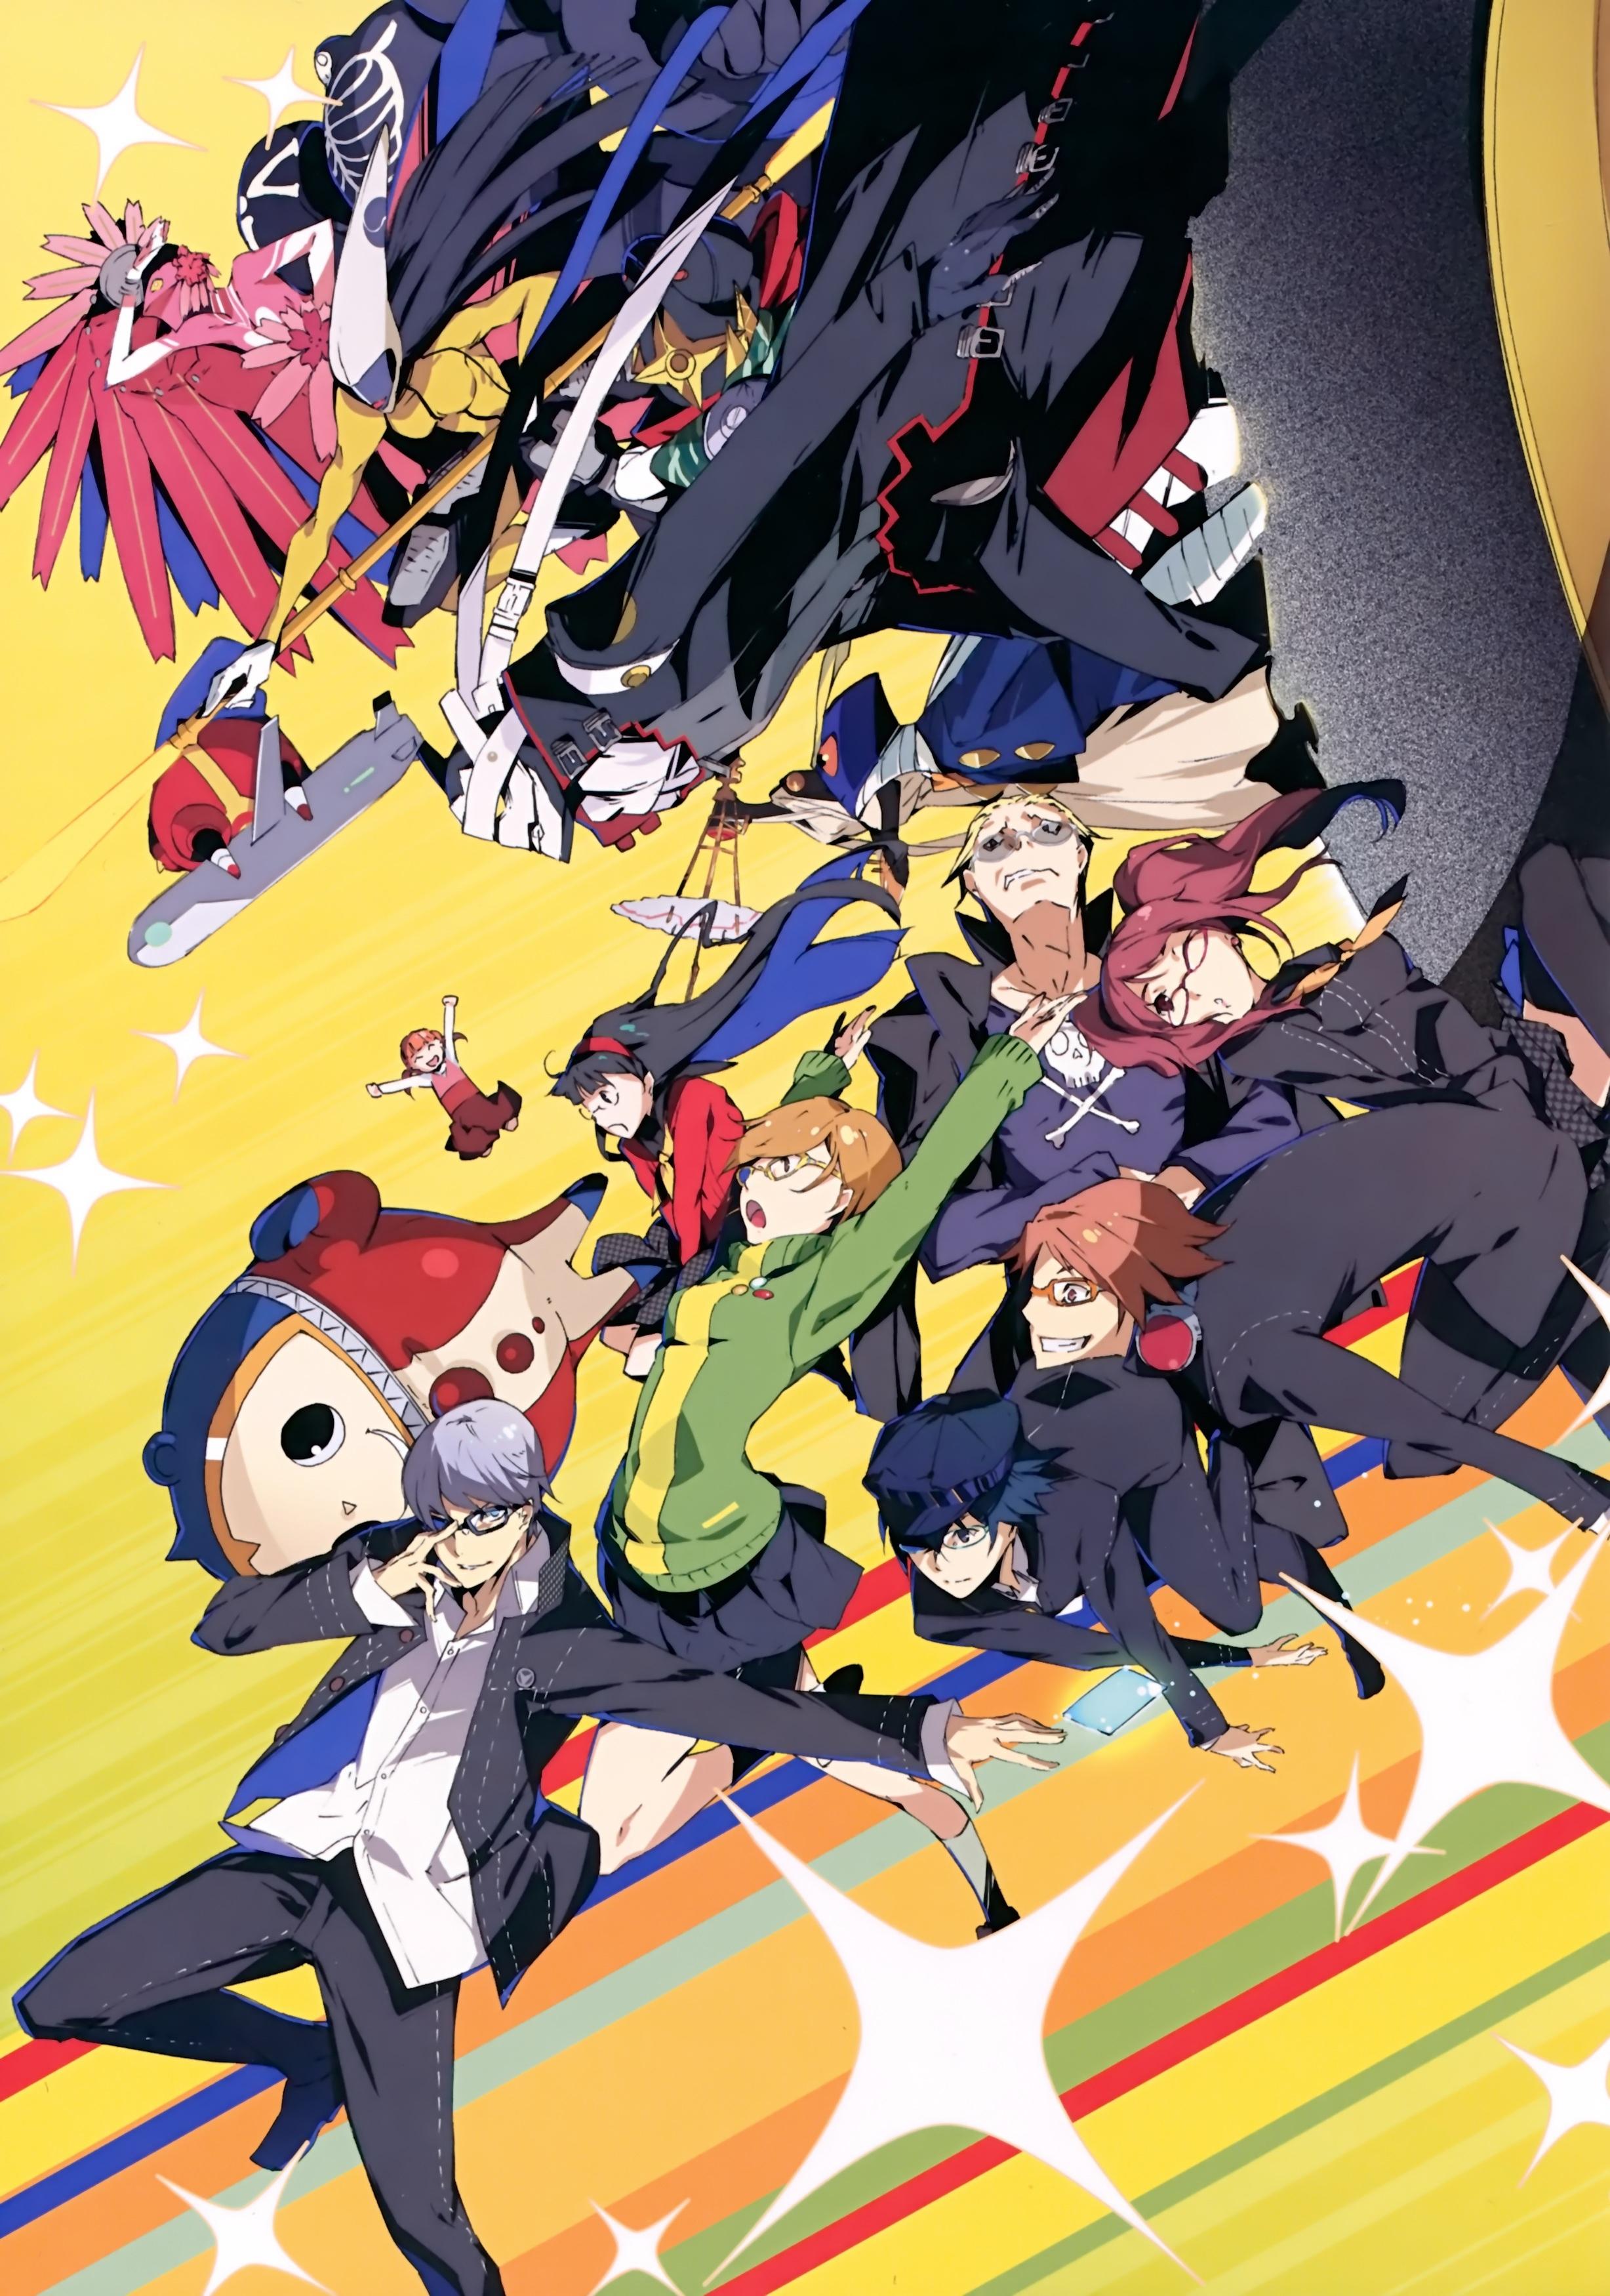 shin megami tensei: persona 4 mobile wallpaper #1411611 - zerochan